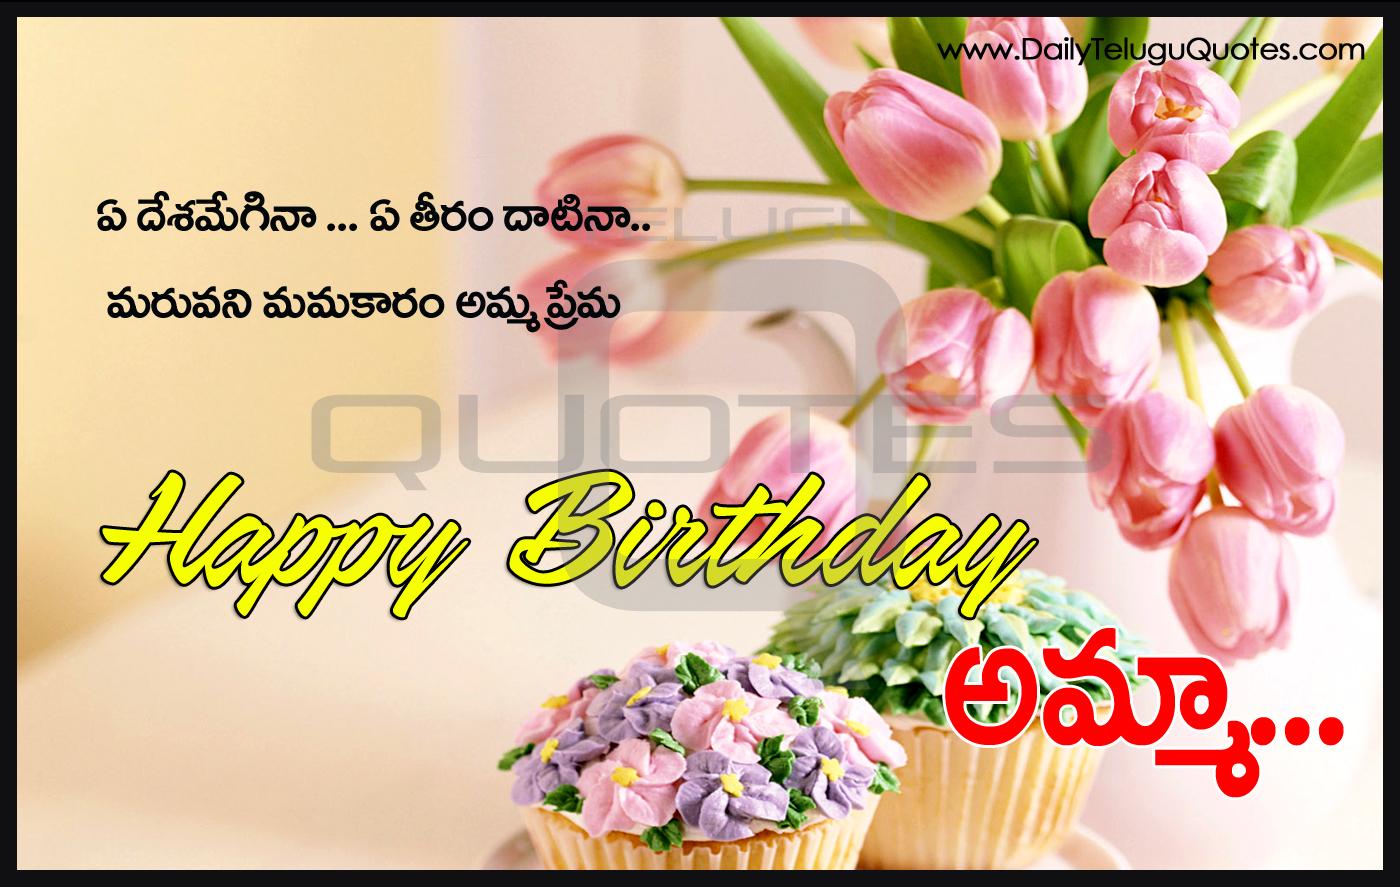 Amma Kavithalu in Telugu Pictures Best Happy Birthday Greetings in – Telugu Birthday Greetings